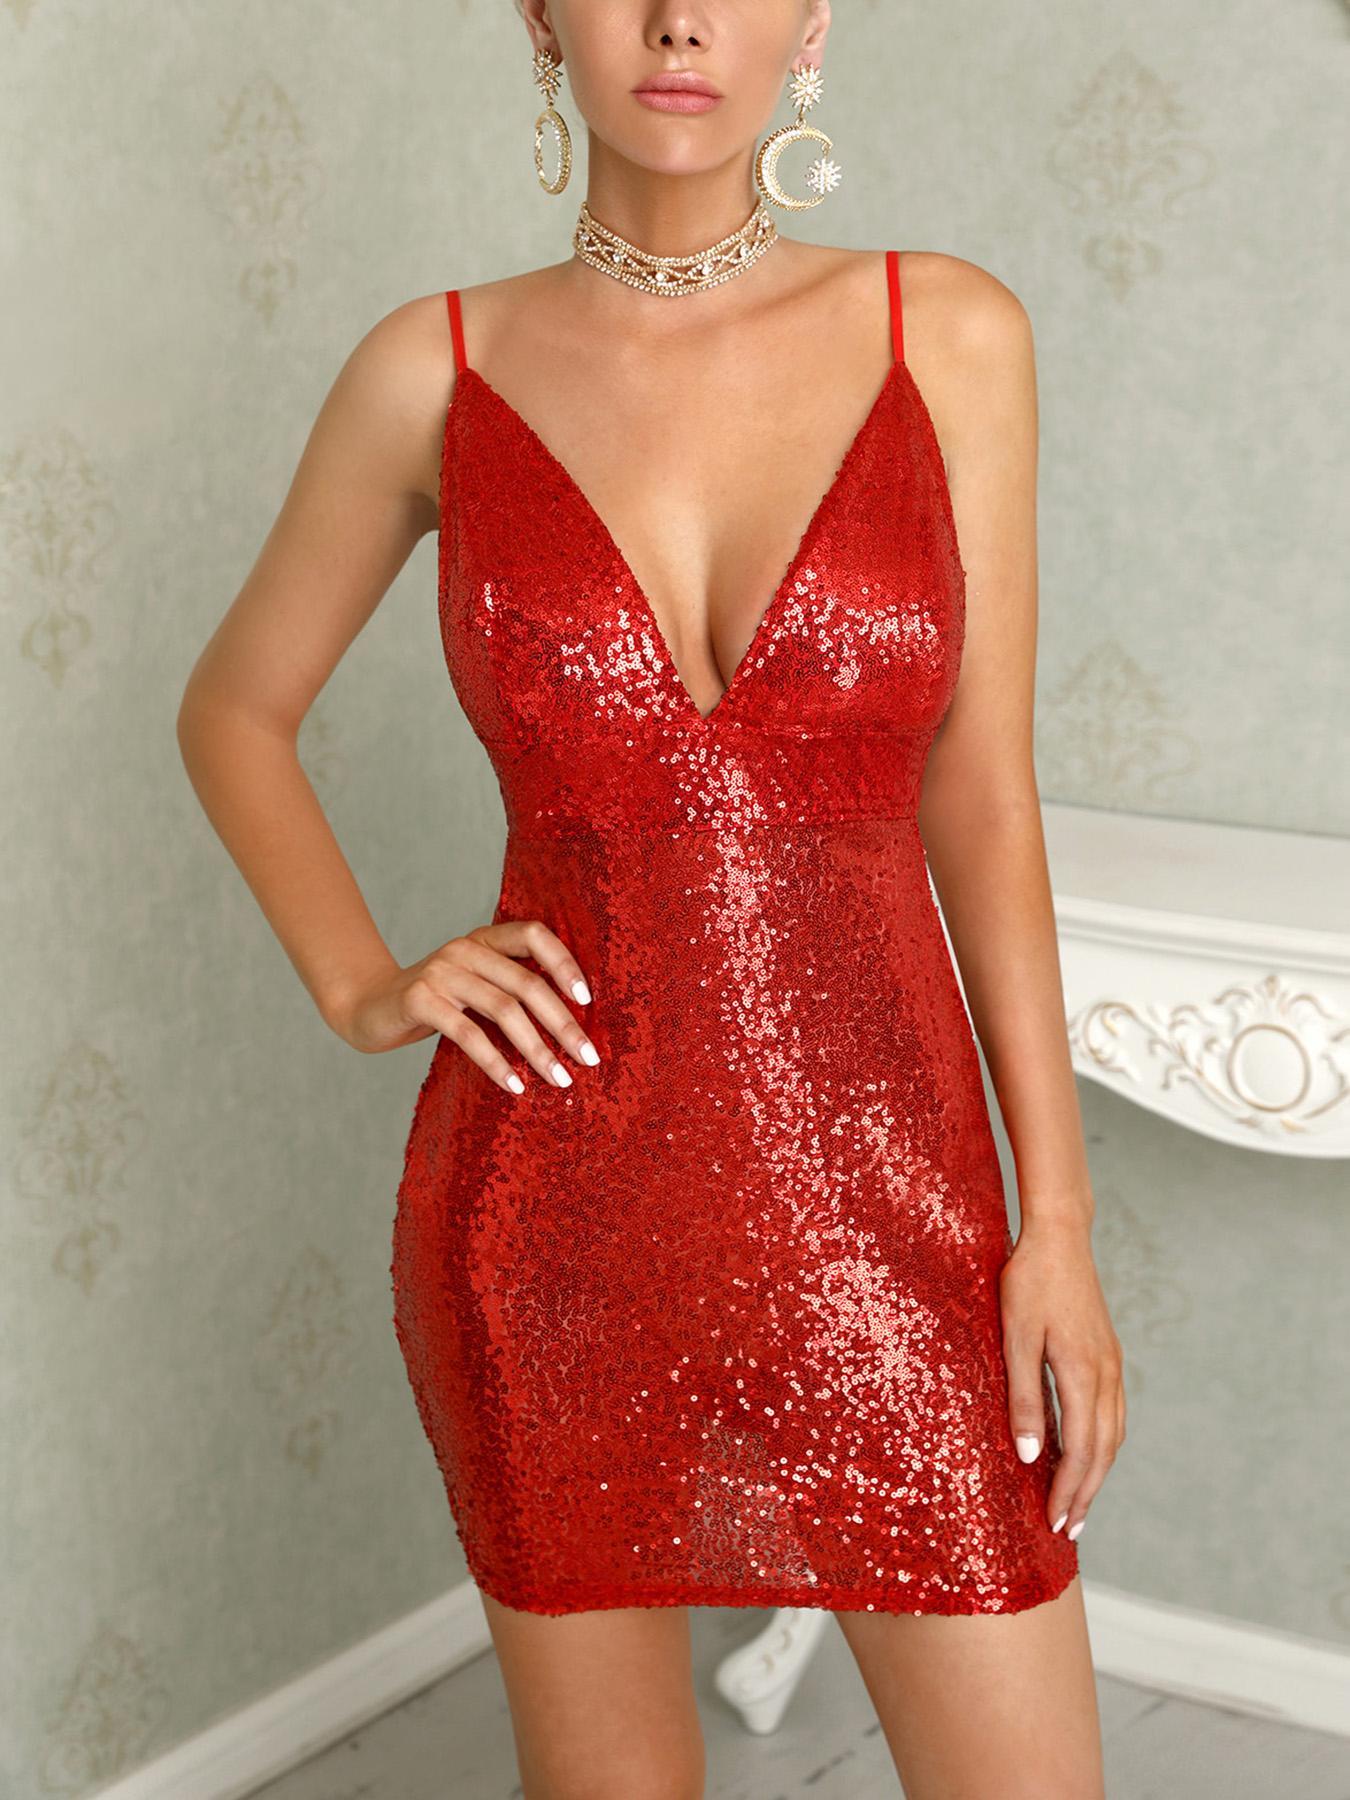 joyshoetique / Deep V Sleeveless Bodycon Sequin Dress